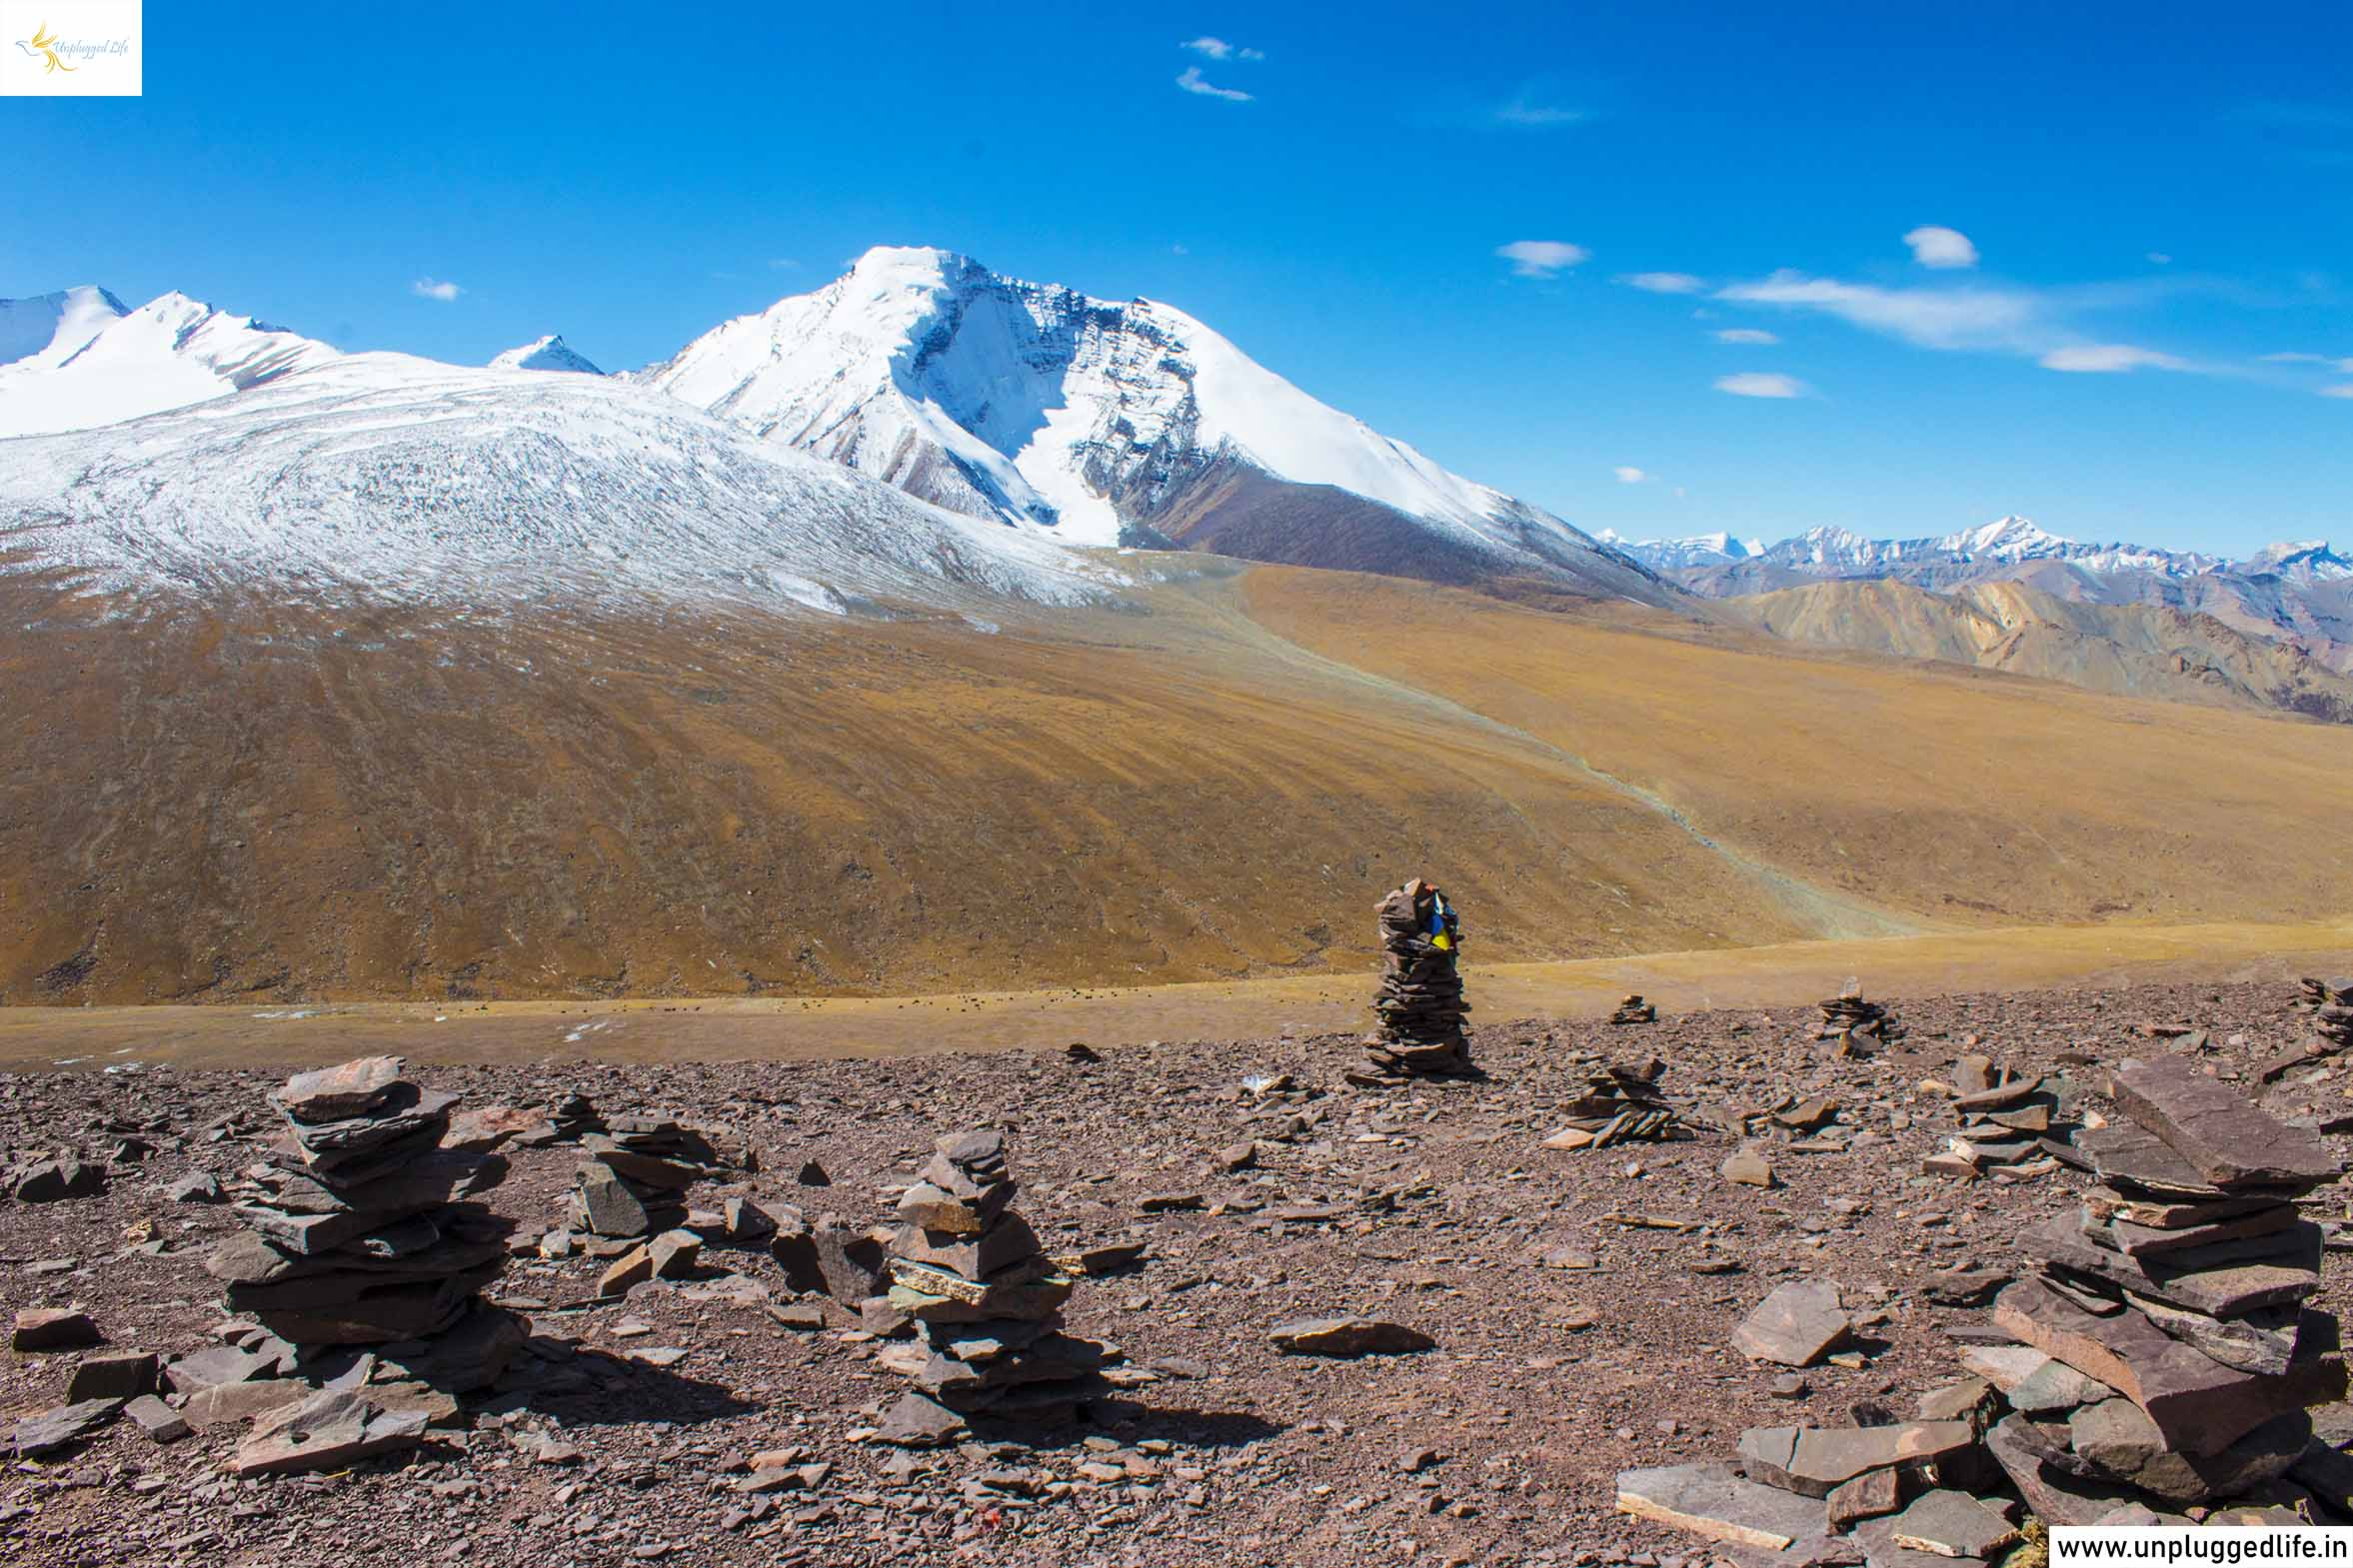 Markha Valley Trek, Kongmaru La, Ladakh Mountain Range, Zanskar Mountain Range, Kang Yatse I, Kang Yaste II, Mountains in Ladakh, Peaks in Ladakh, Treks in Ladakh, Markha Valley, Markha Valley in Ladakh, Solo Trekking in Ladakh, Trekking in Ladakh, Trekking in Markha Valley, High Altitude Mountains in Ladakh, High Mountains in Ladakh, Markha Valley Trek in Leh-Ladakh, Leh-Ladakh, Unplugged Life, Glacier in Ladakh, Kongmaru La Top